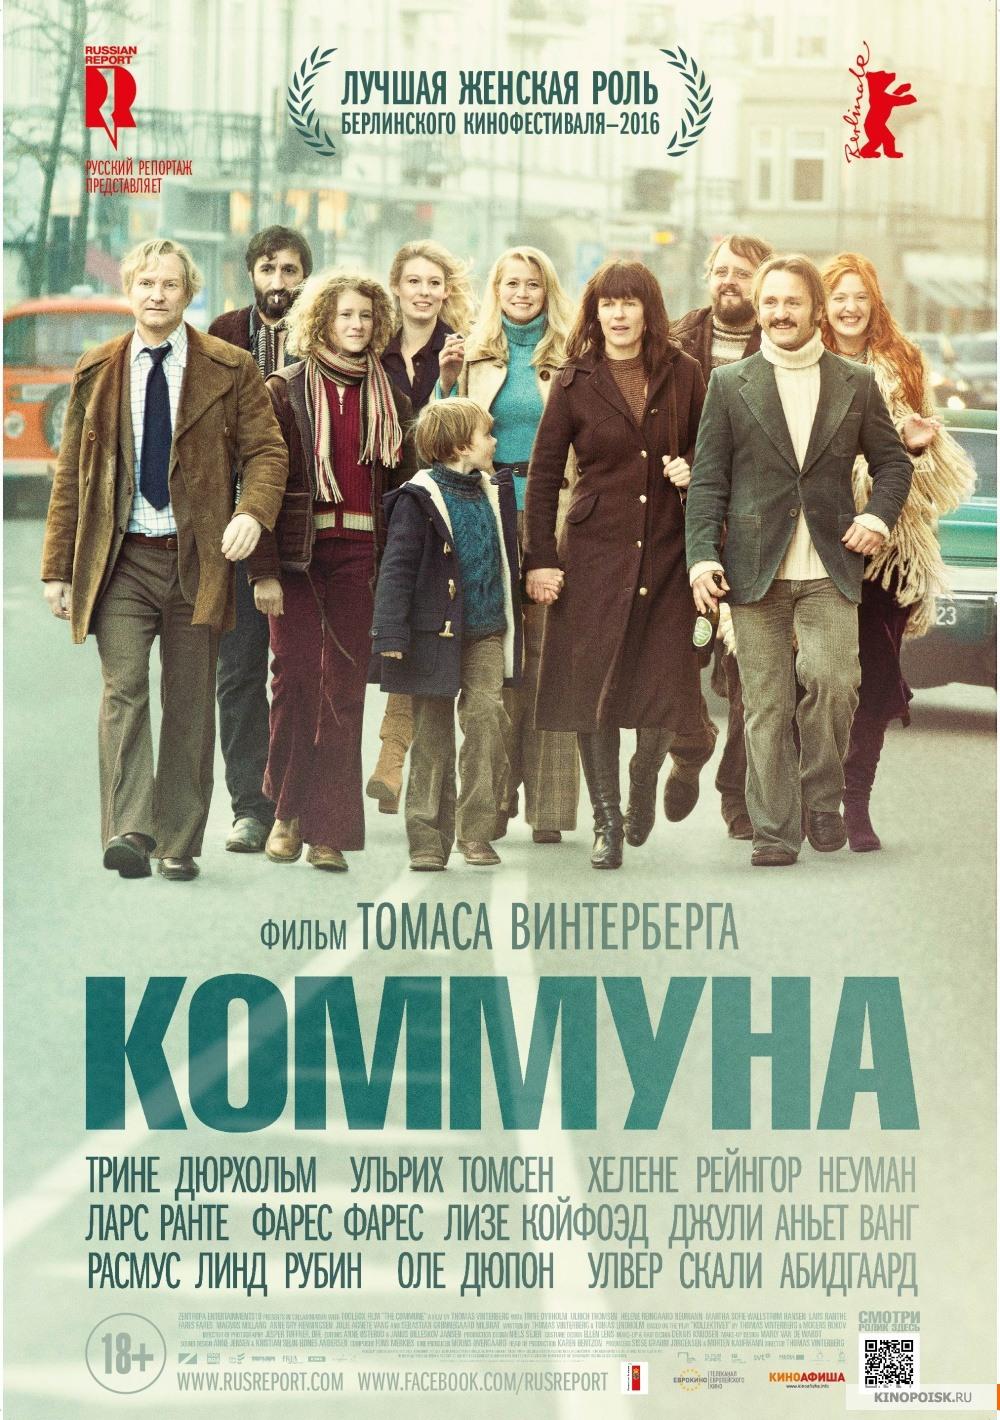 Коммуна (Kollektivet), 2015